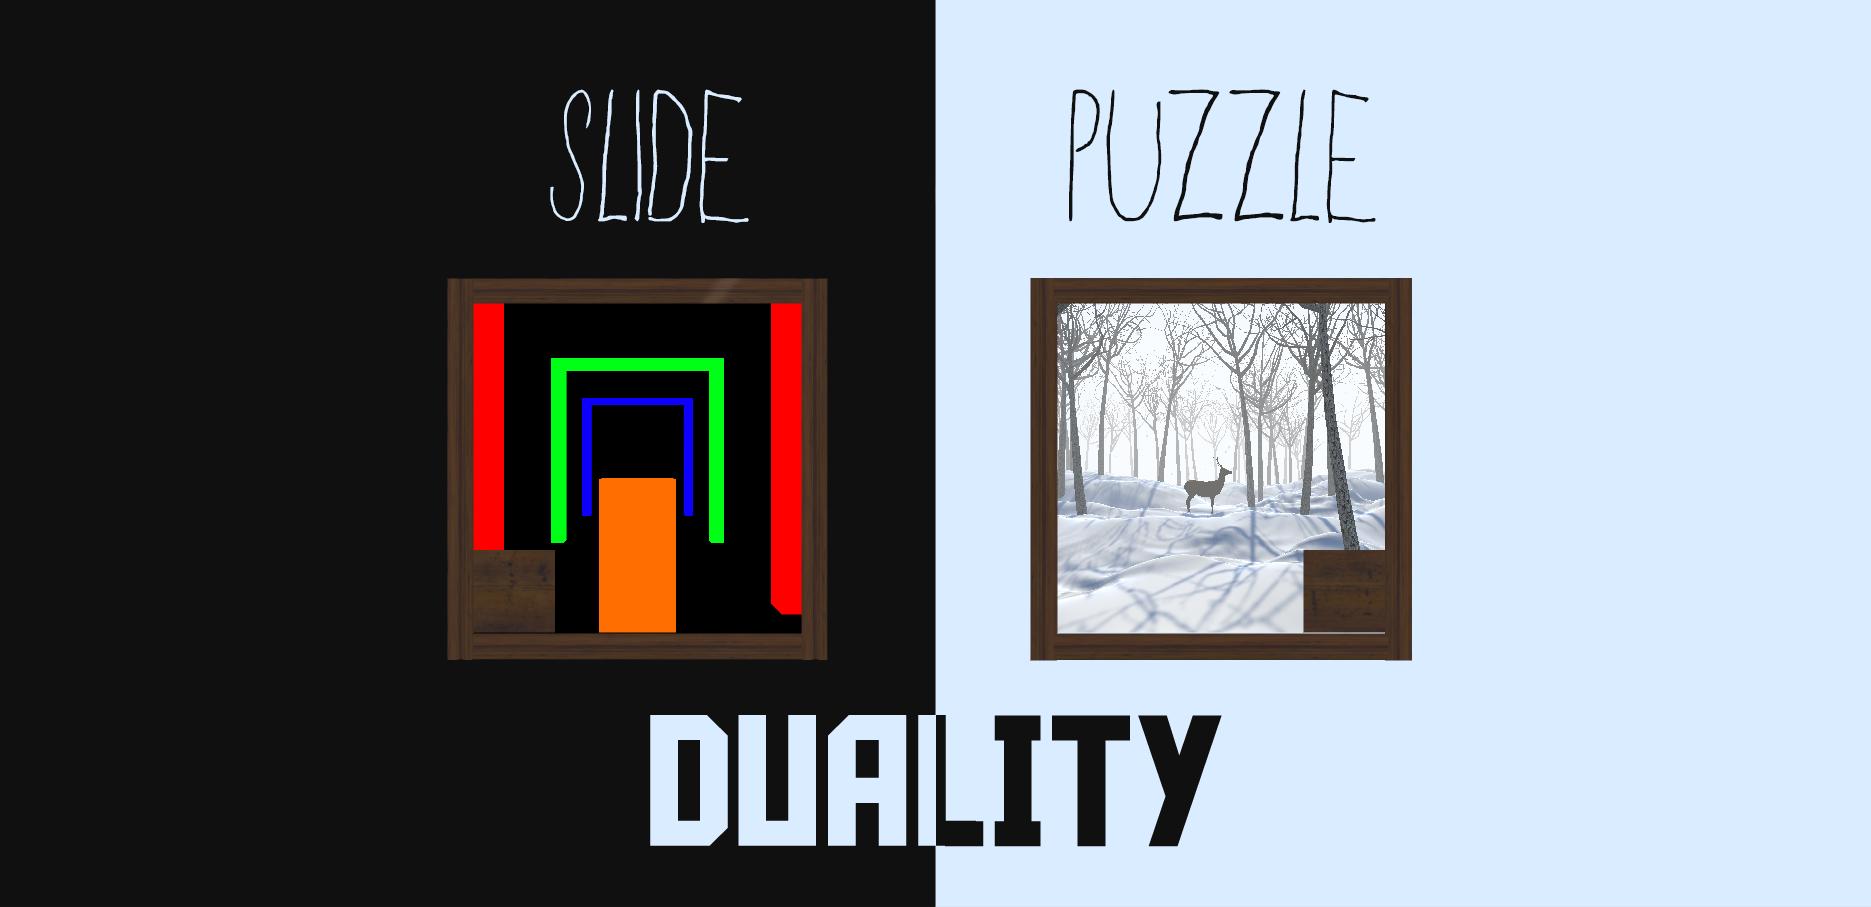 Slide Puzzle - Duality